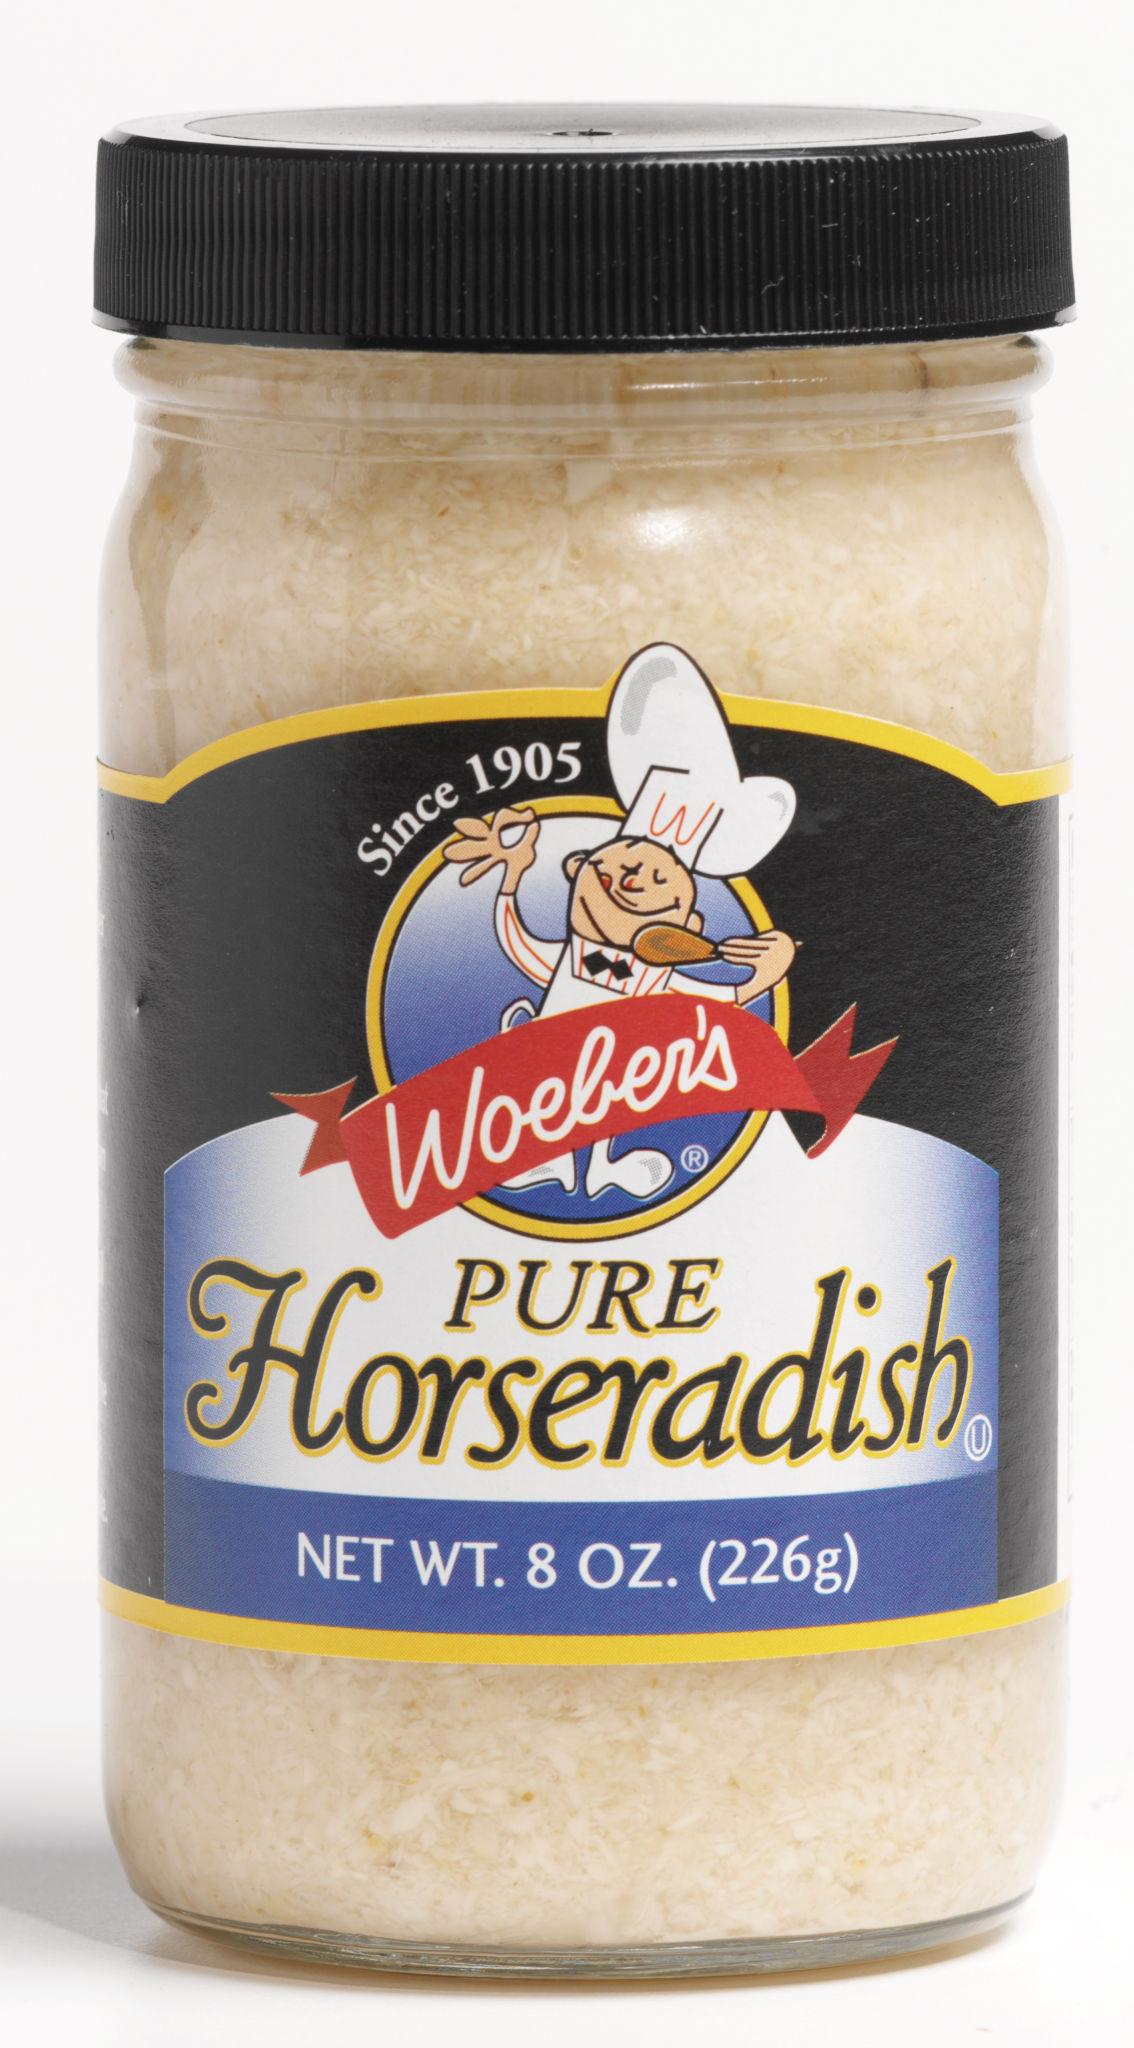 Woeber S Mustard Company Horseradish